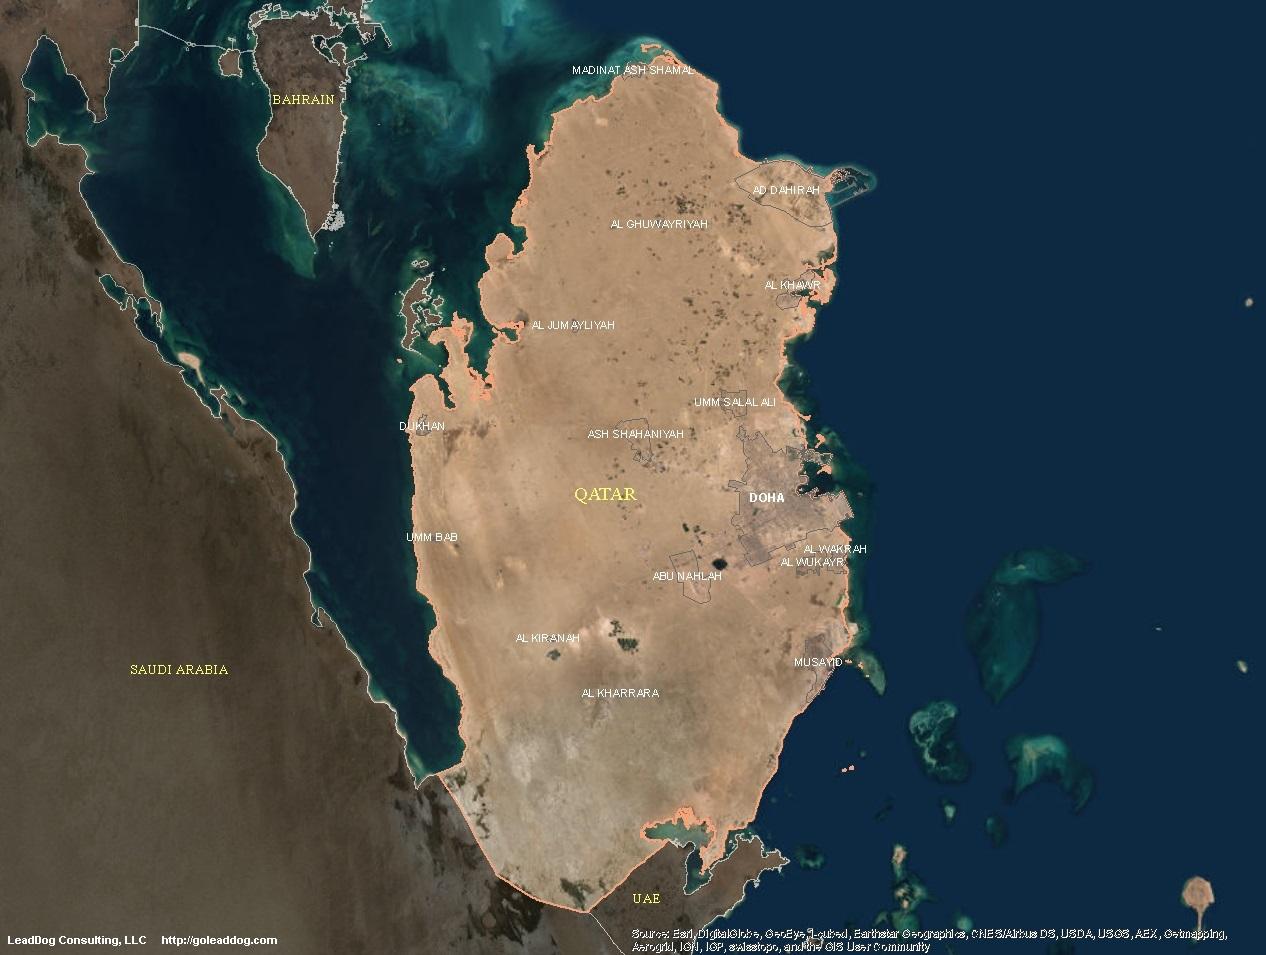 Qatar Satellite Maps | LeadDog Consulting